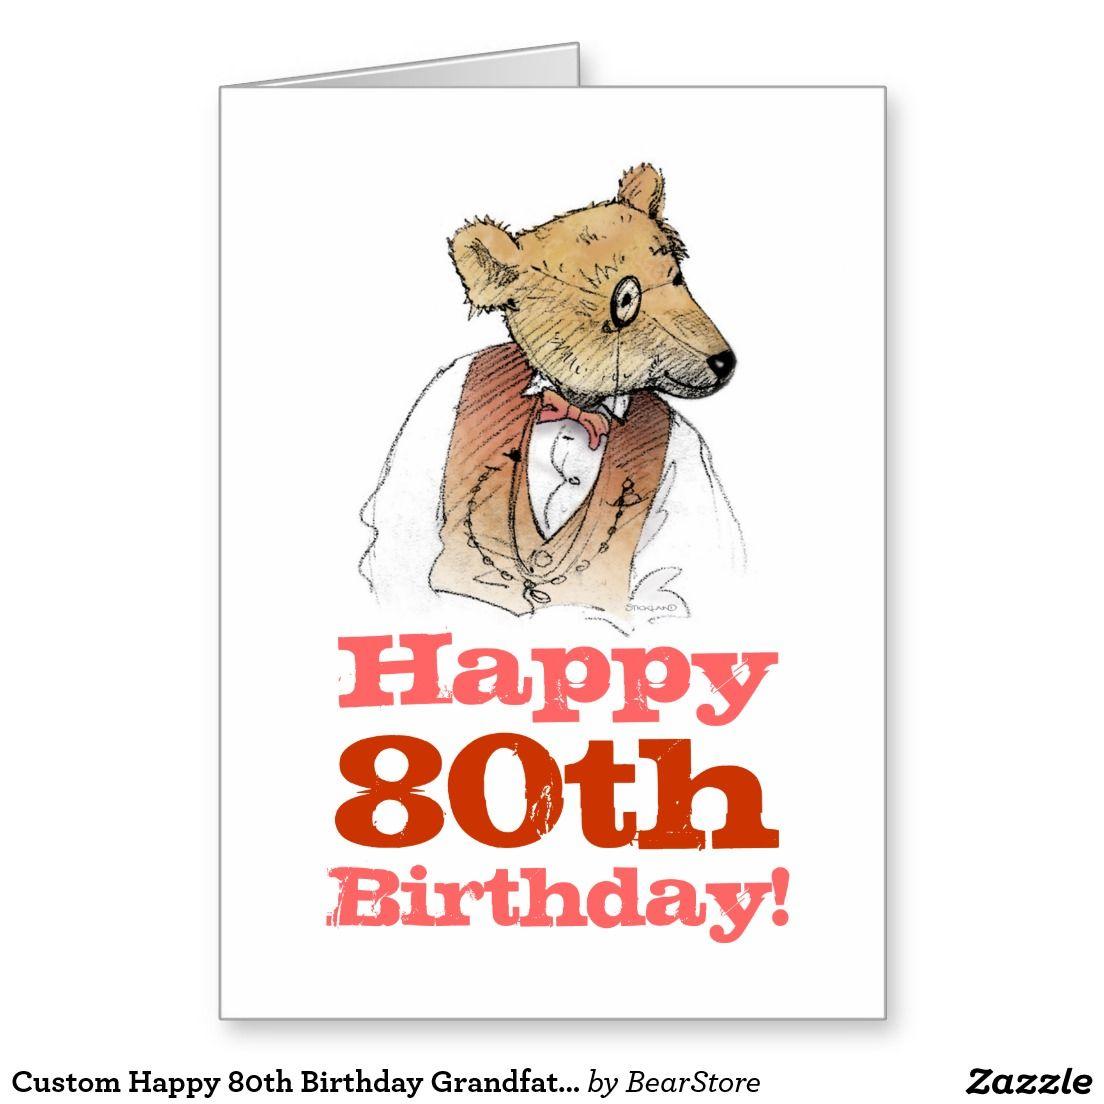 Custom happy 80th birthday grandfather bear greeting card